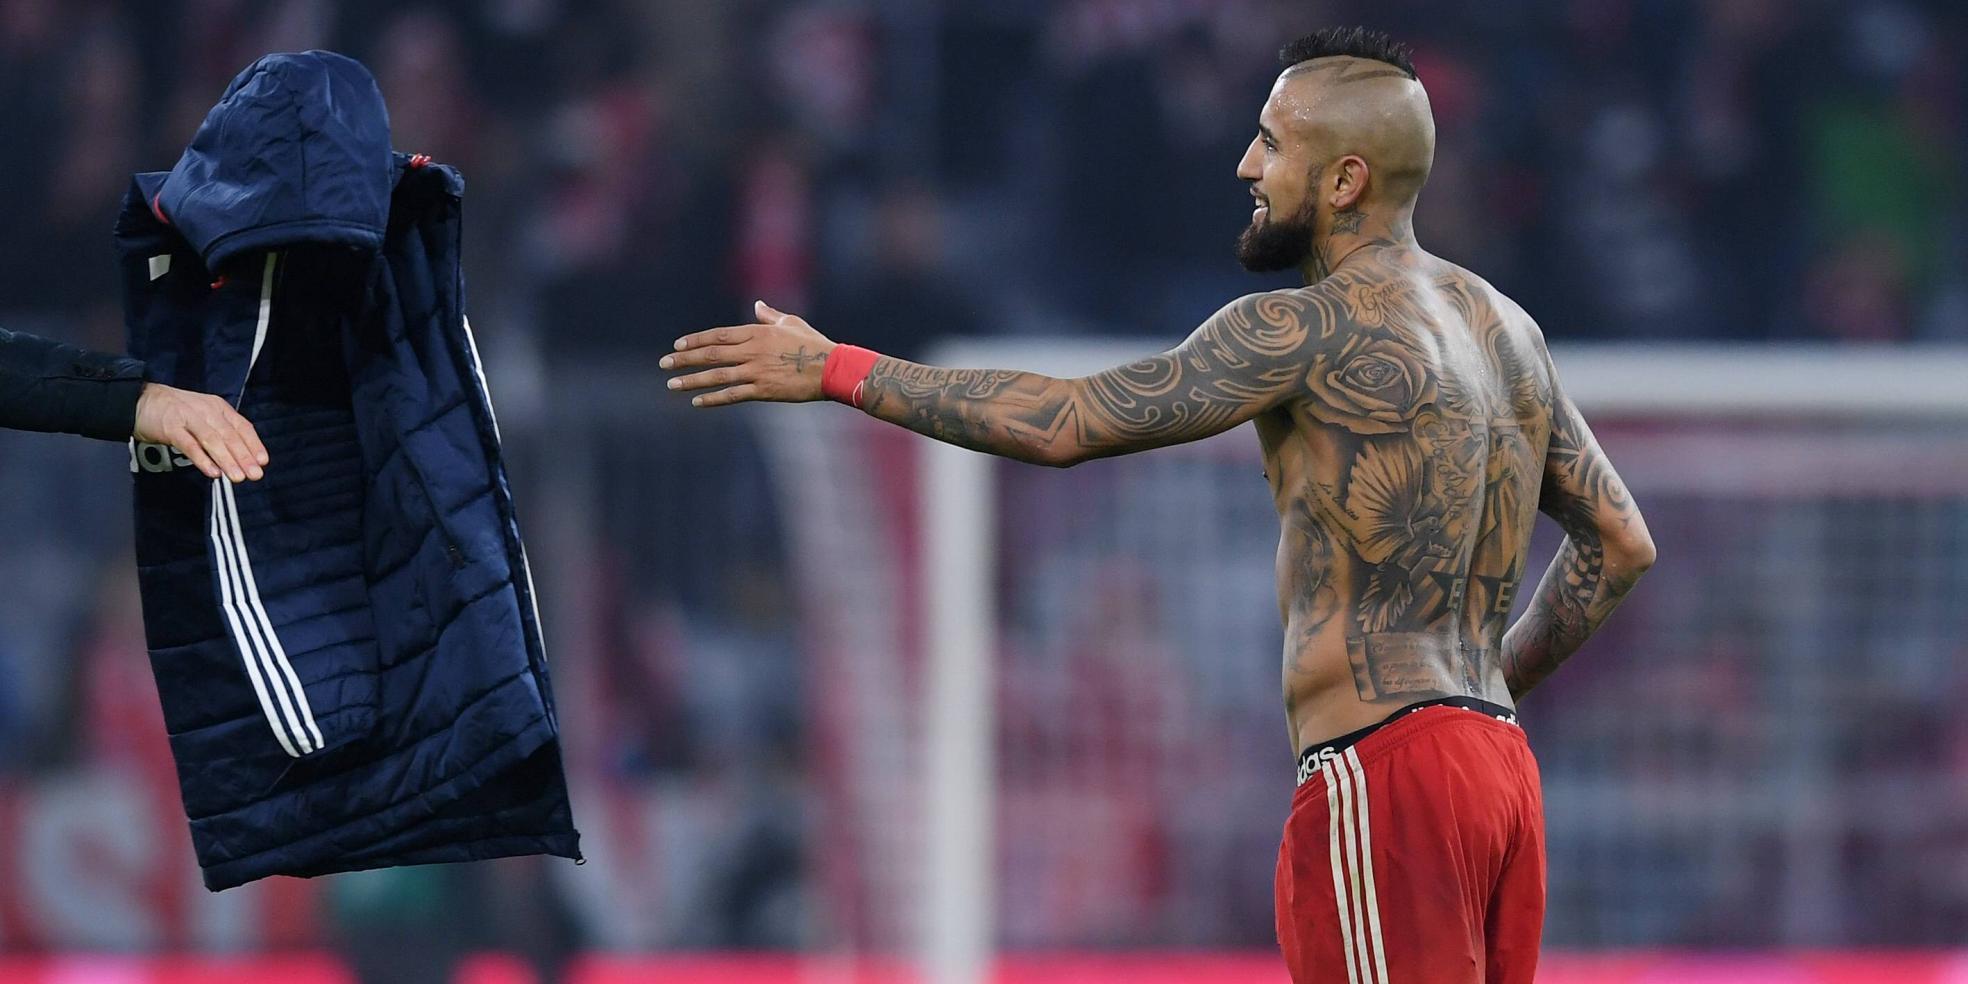 Arturo Vidal vom FC Bayern München